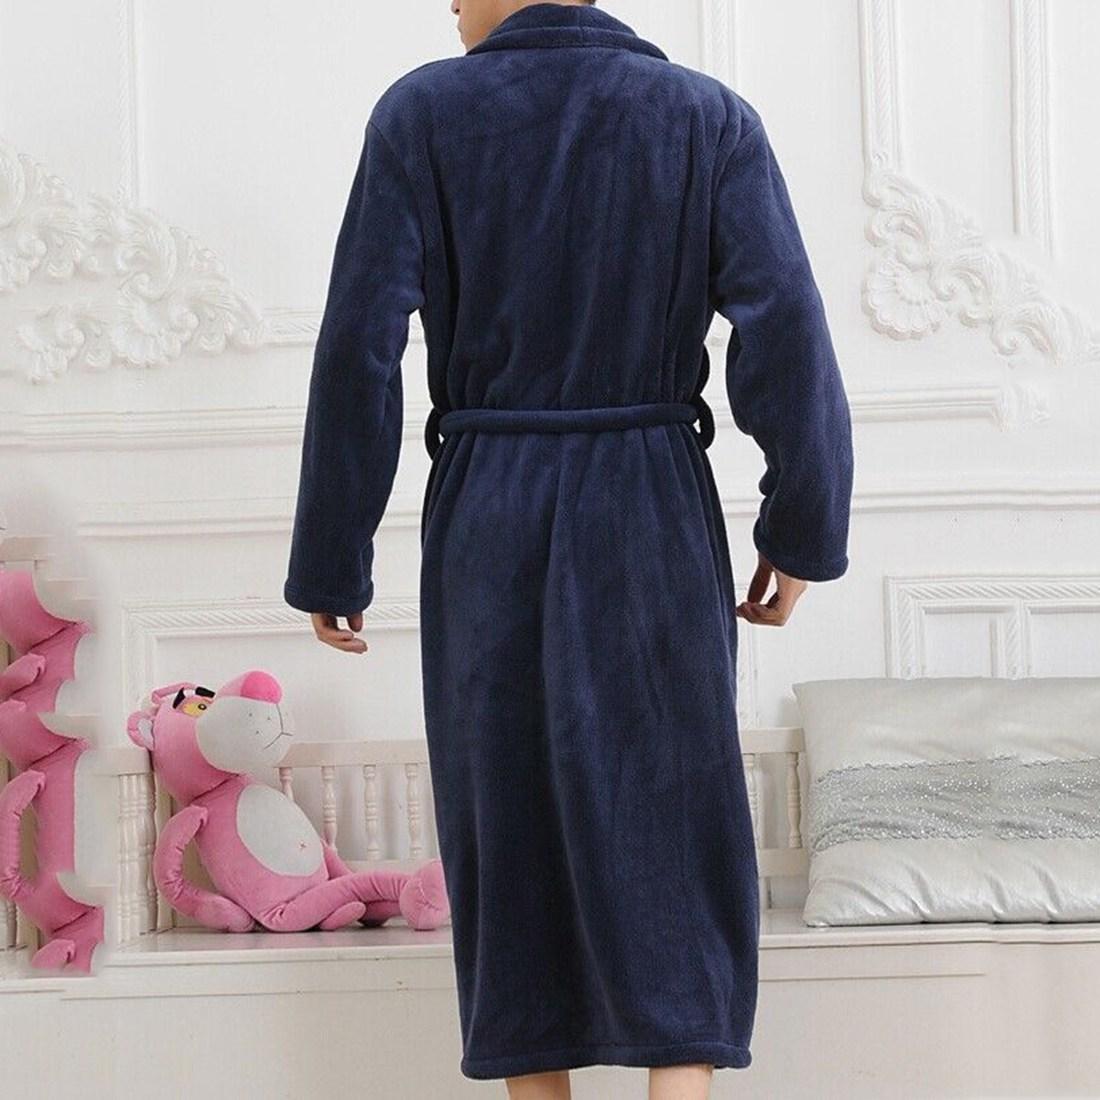 autumn peignoir femme capuche capuche women badjas night robe winter women 39 s long gown. Black Bedroom Furniture Sets. Home Design Ideas